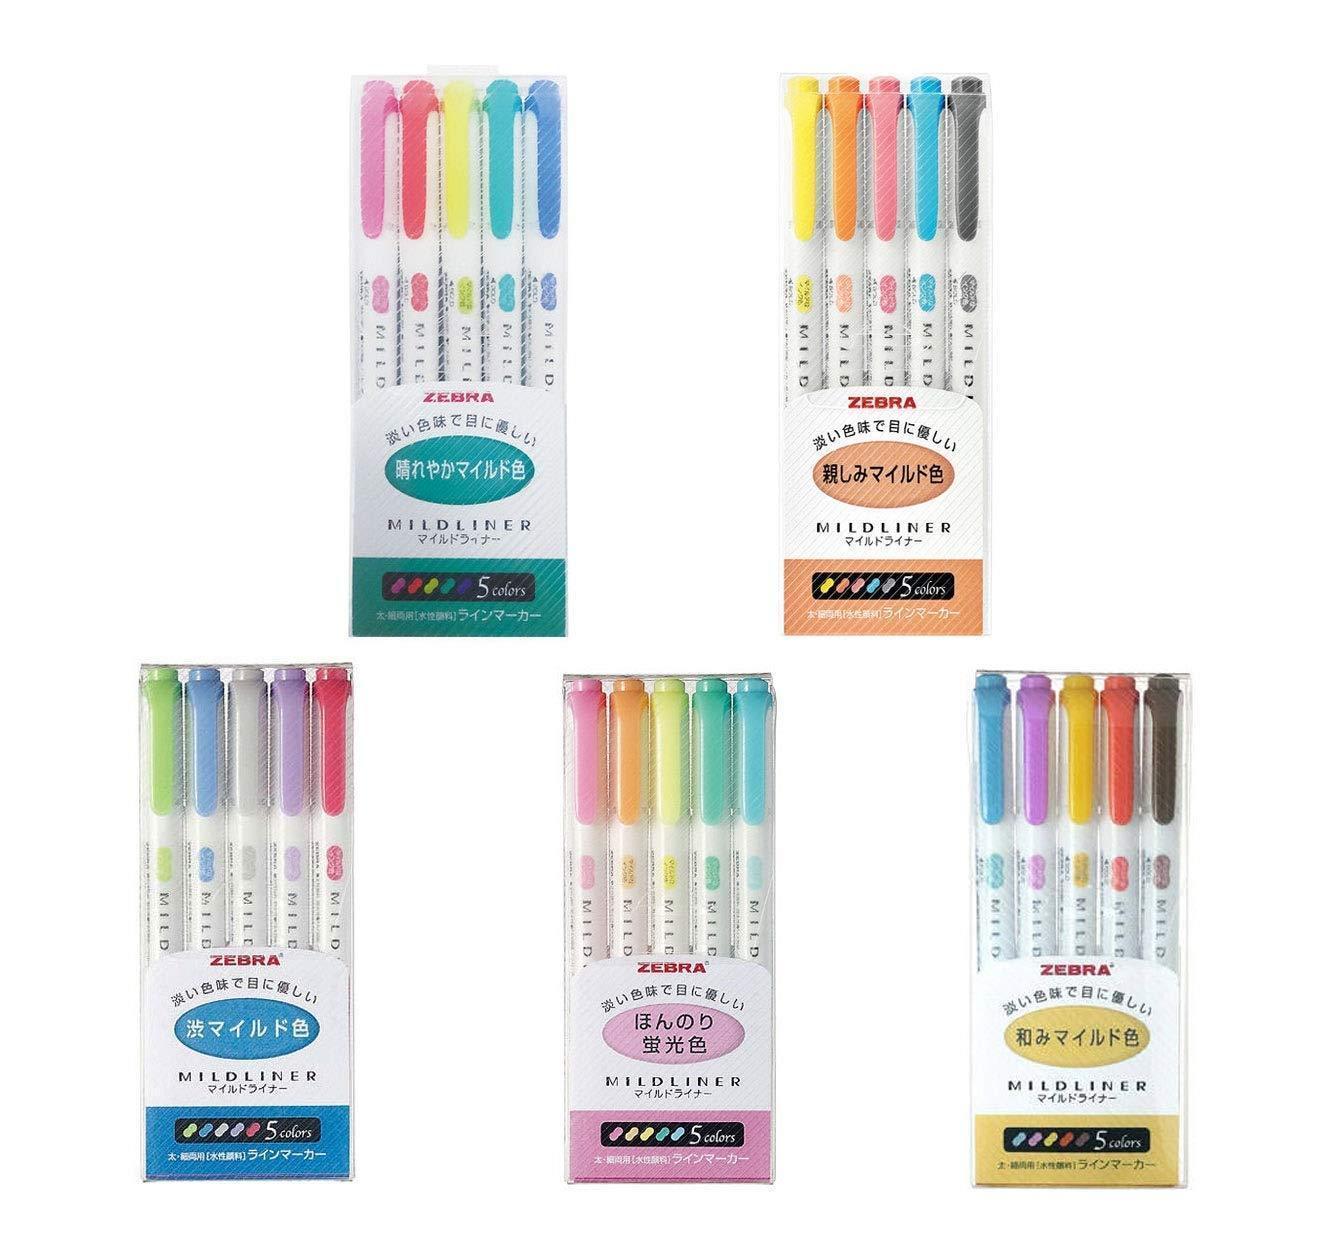 25 Colors Zebra Mildliner Double-Sided Highlighter Pen Set 5 Type Japanese Stationery